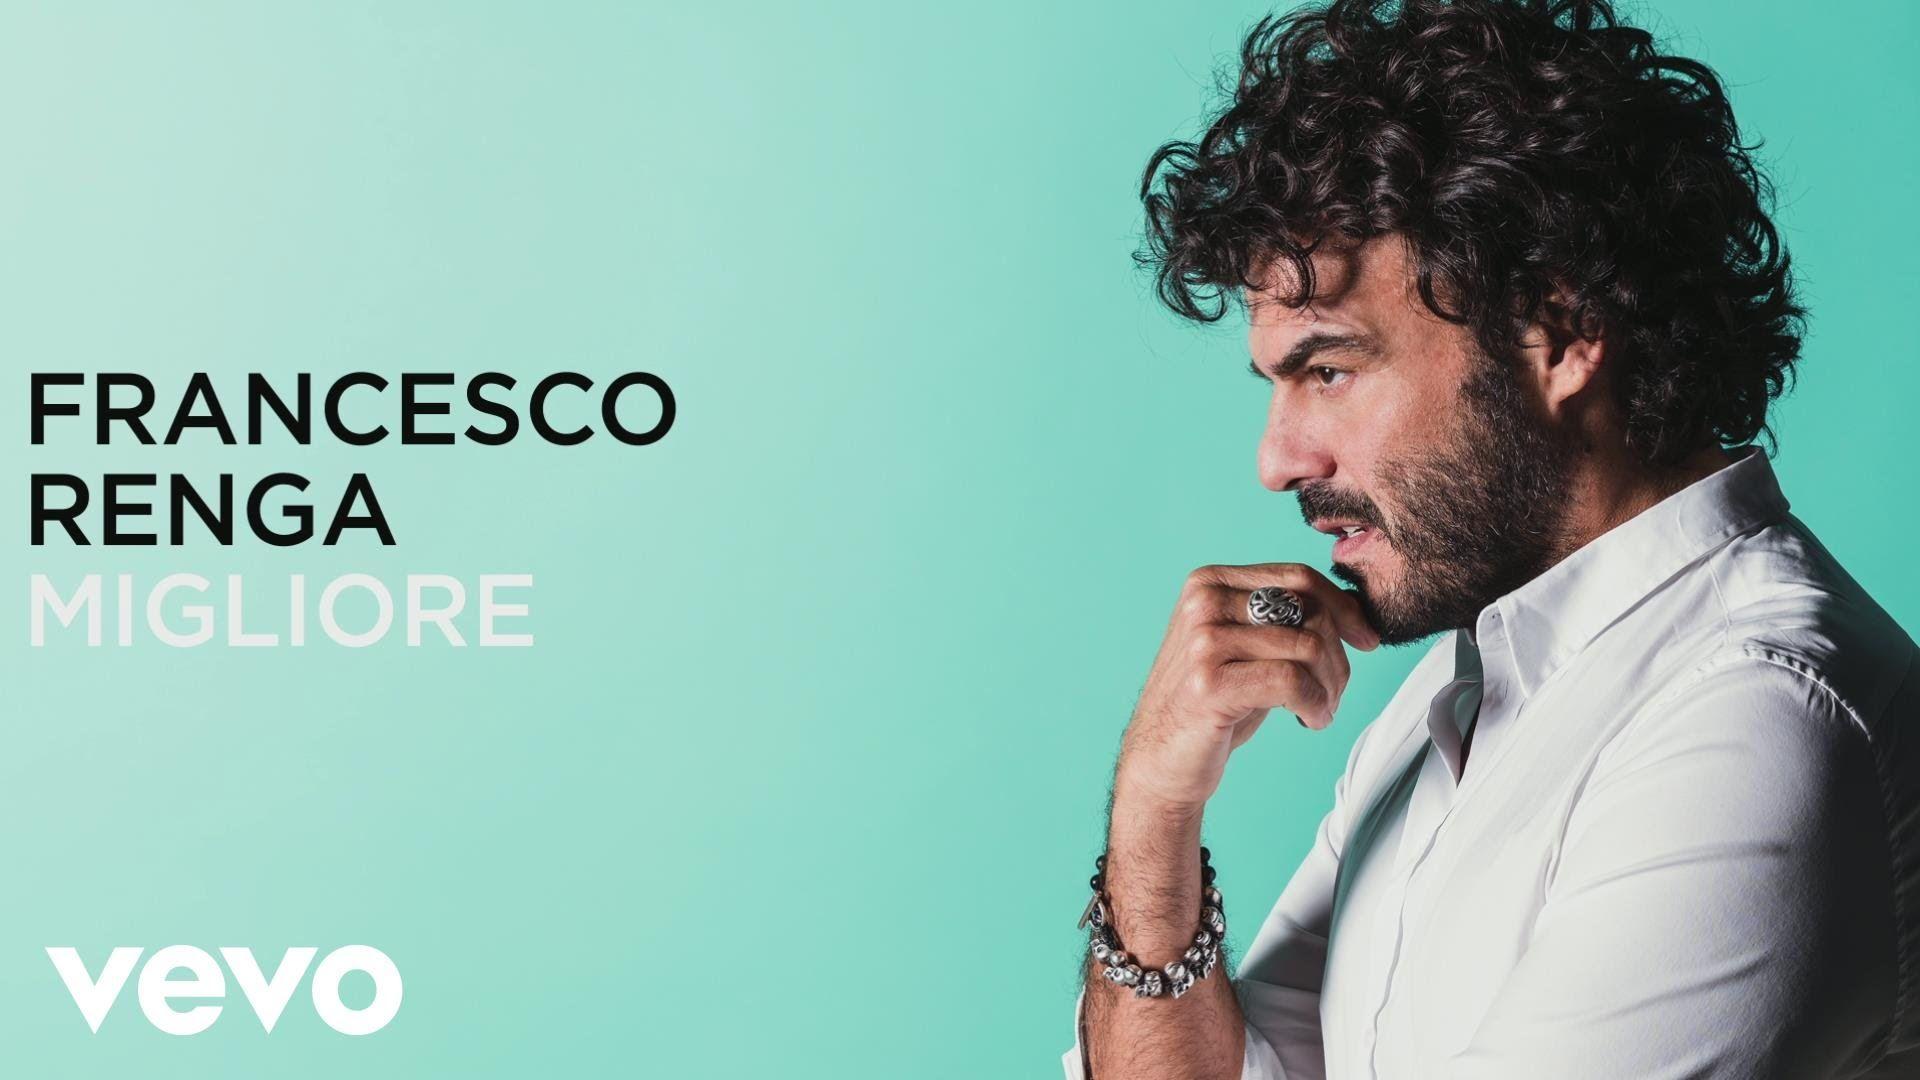 #musica #francescorenga  Francesco Renga - Migliore, con testo e video